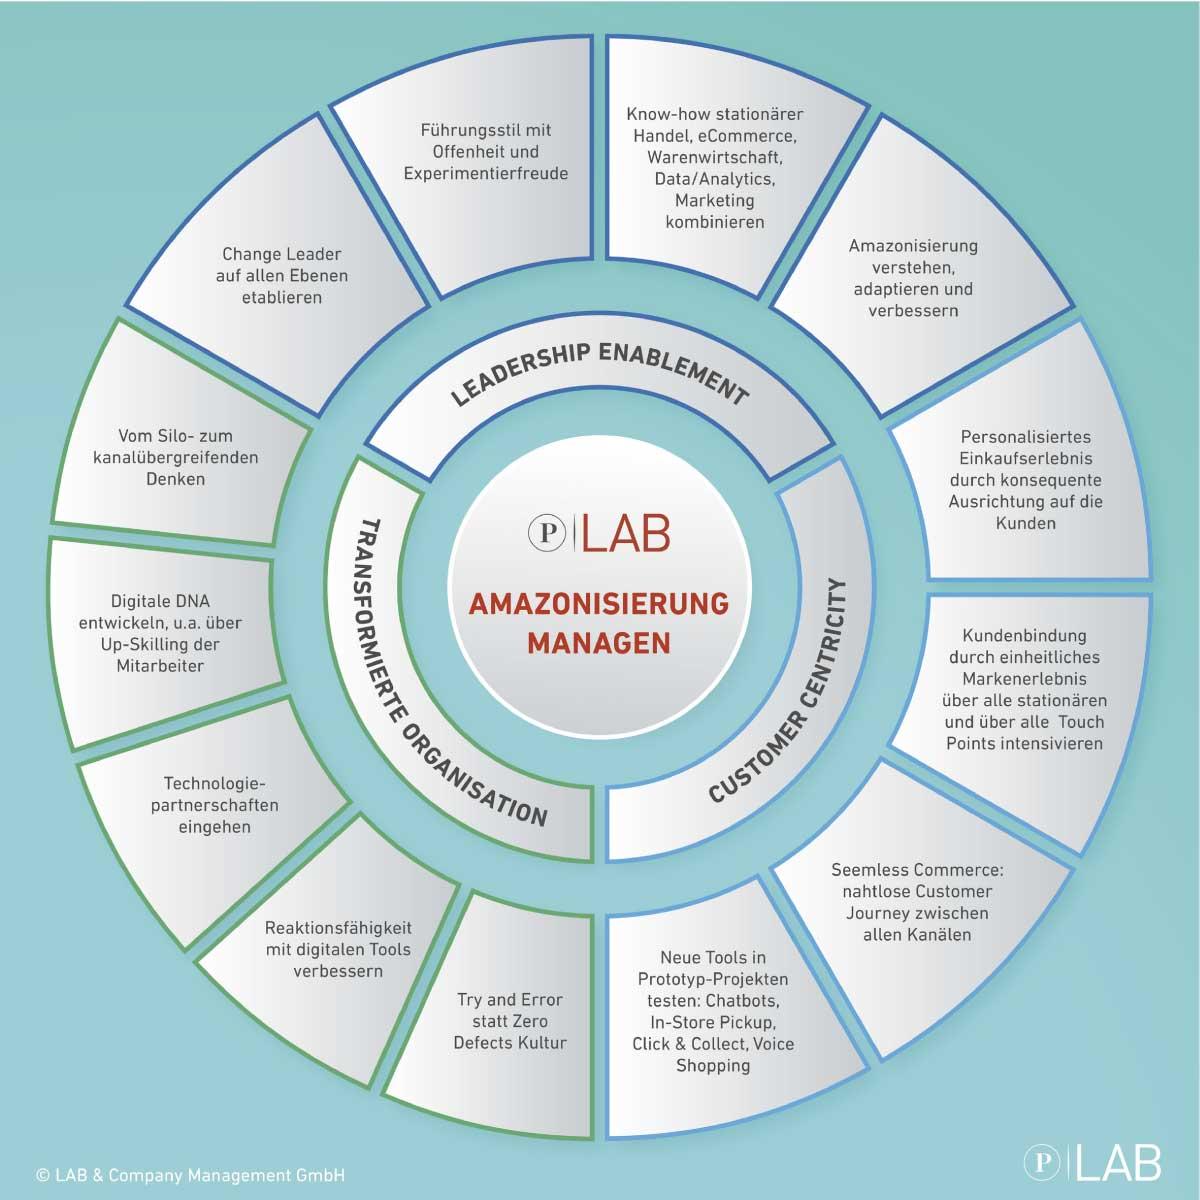 Amazonisierung Managen - Infografik LAB & Company